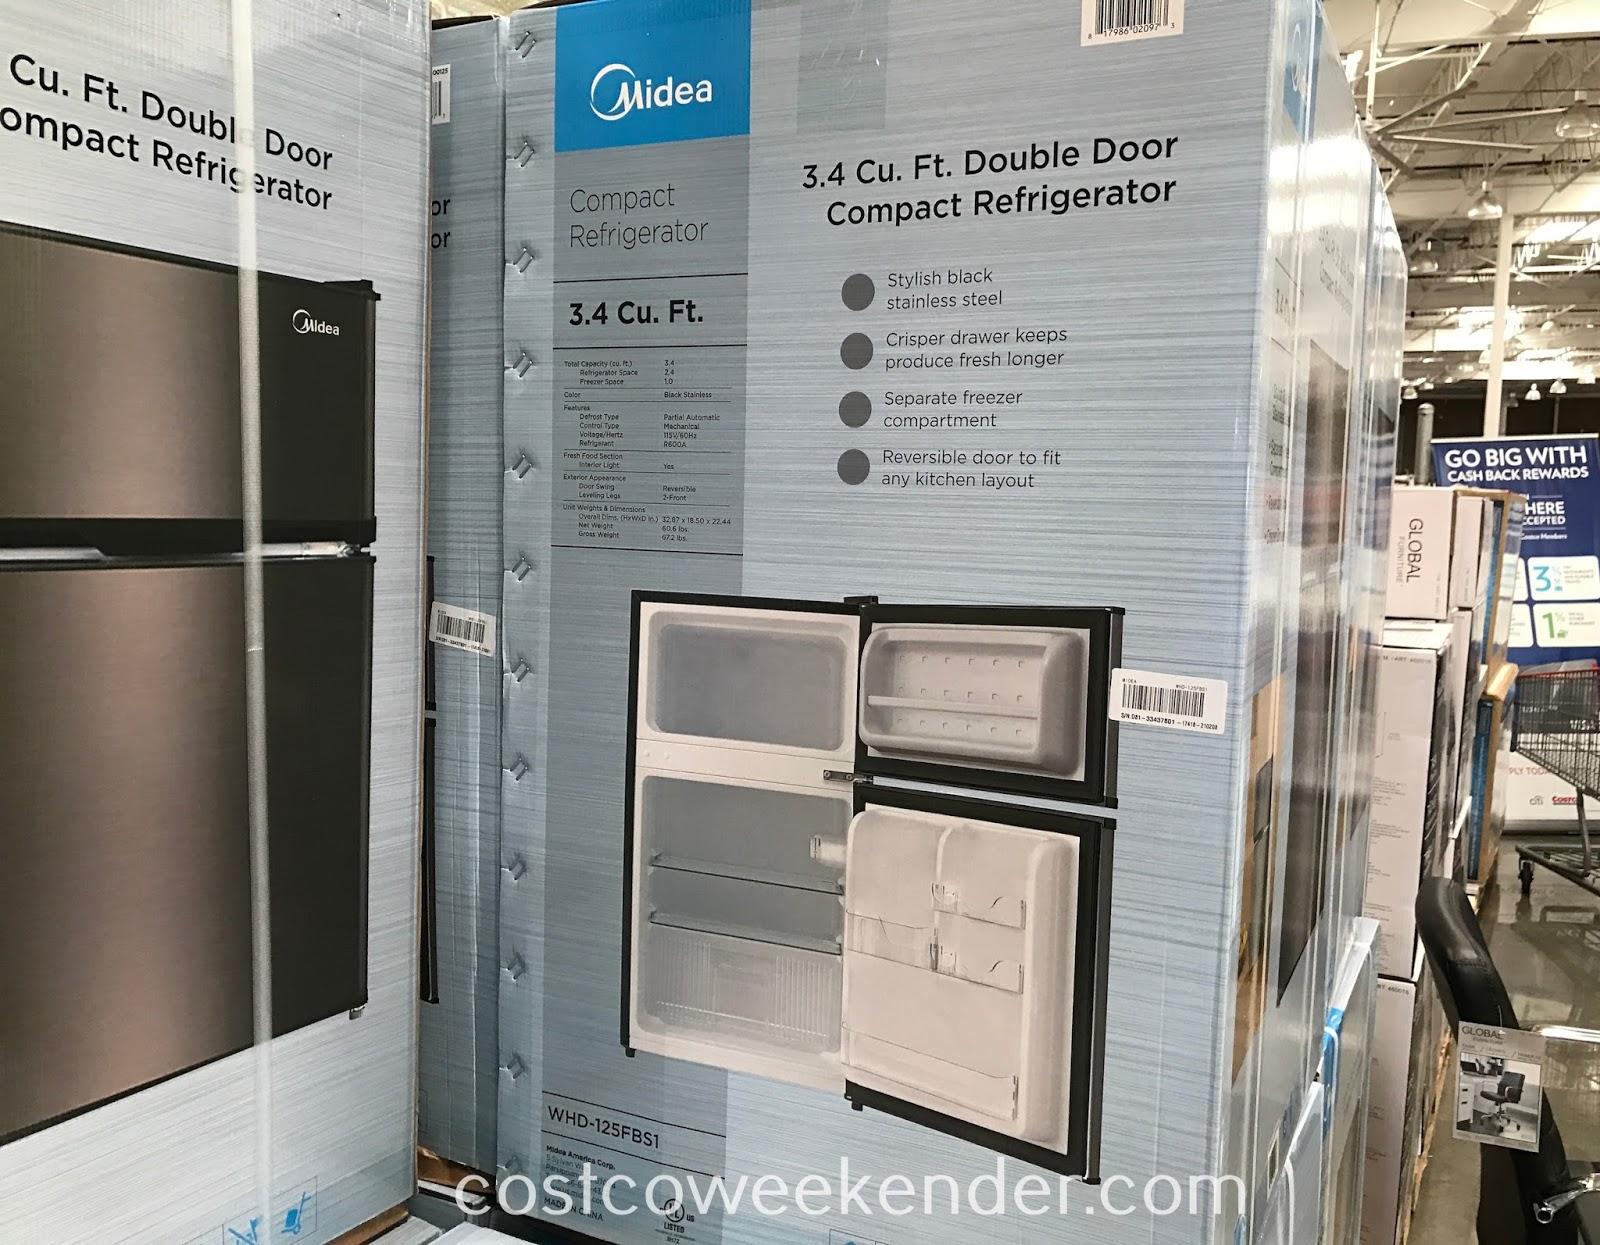 Compact Fridge For Dorm: Midea WHD-125FBS1 3.4 Cu Ft Double Door Compact